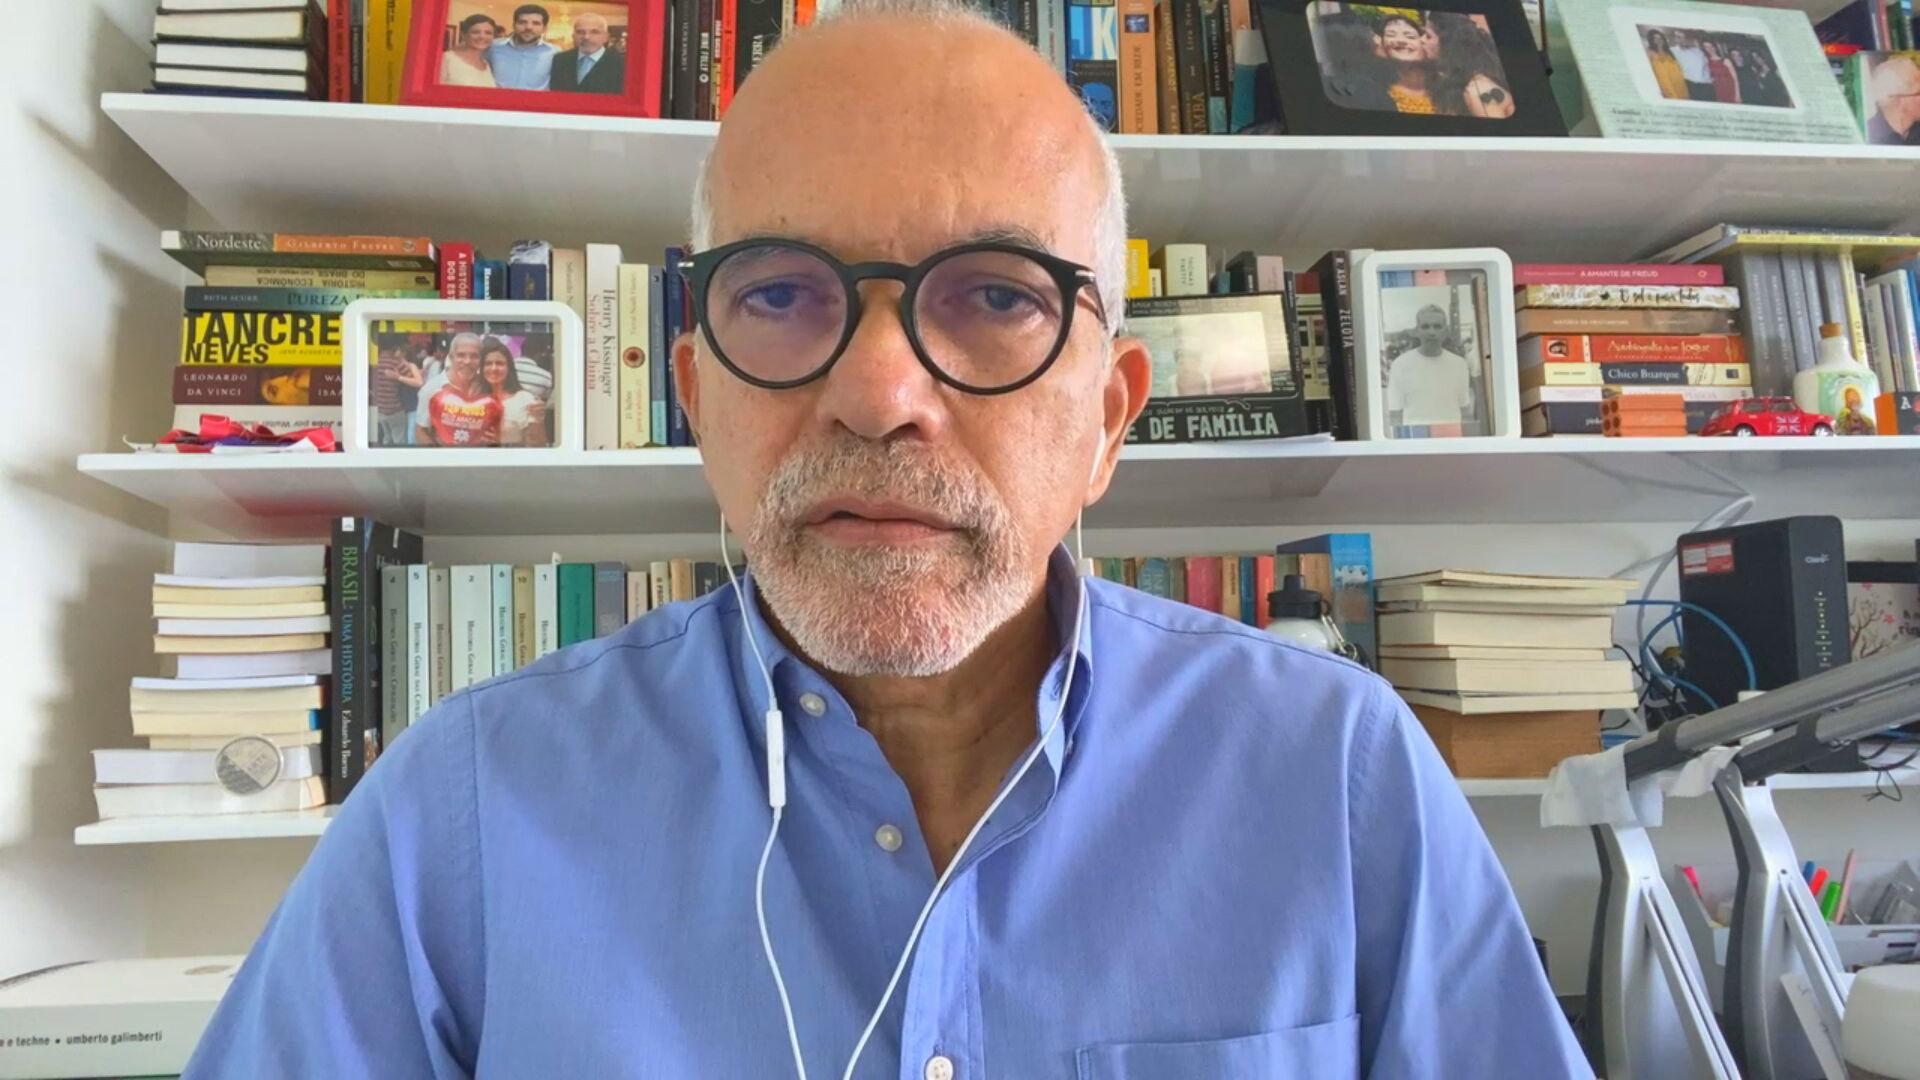 Presidente da Frente Nacional de Prefeitos, Edvaldo Nogueira (30-05-2021)